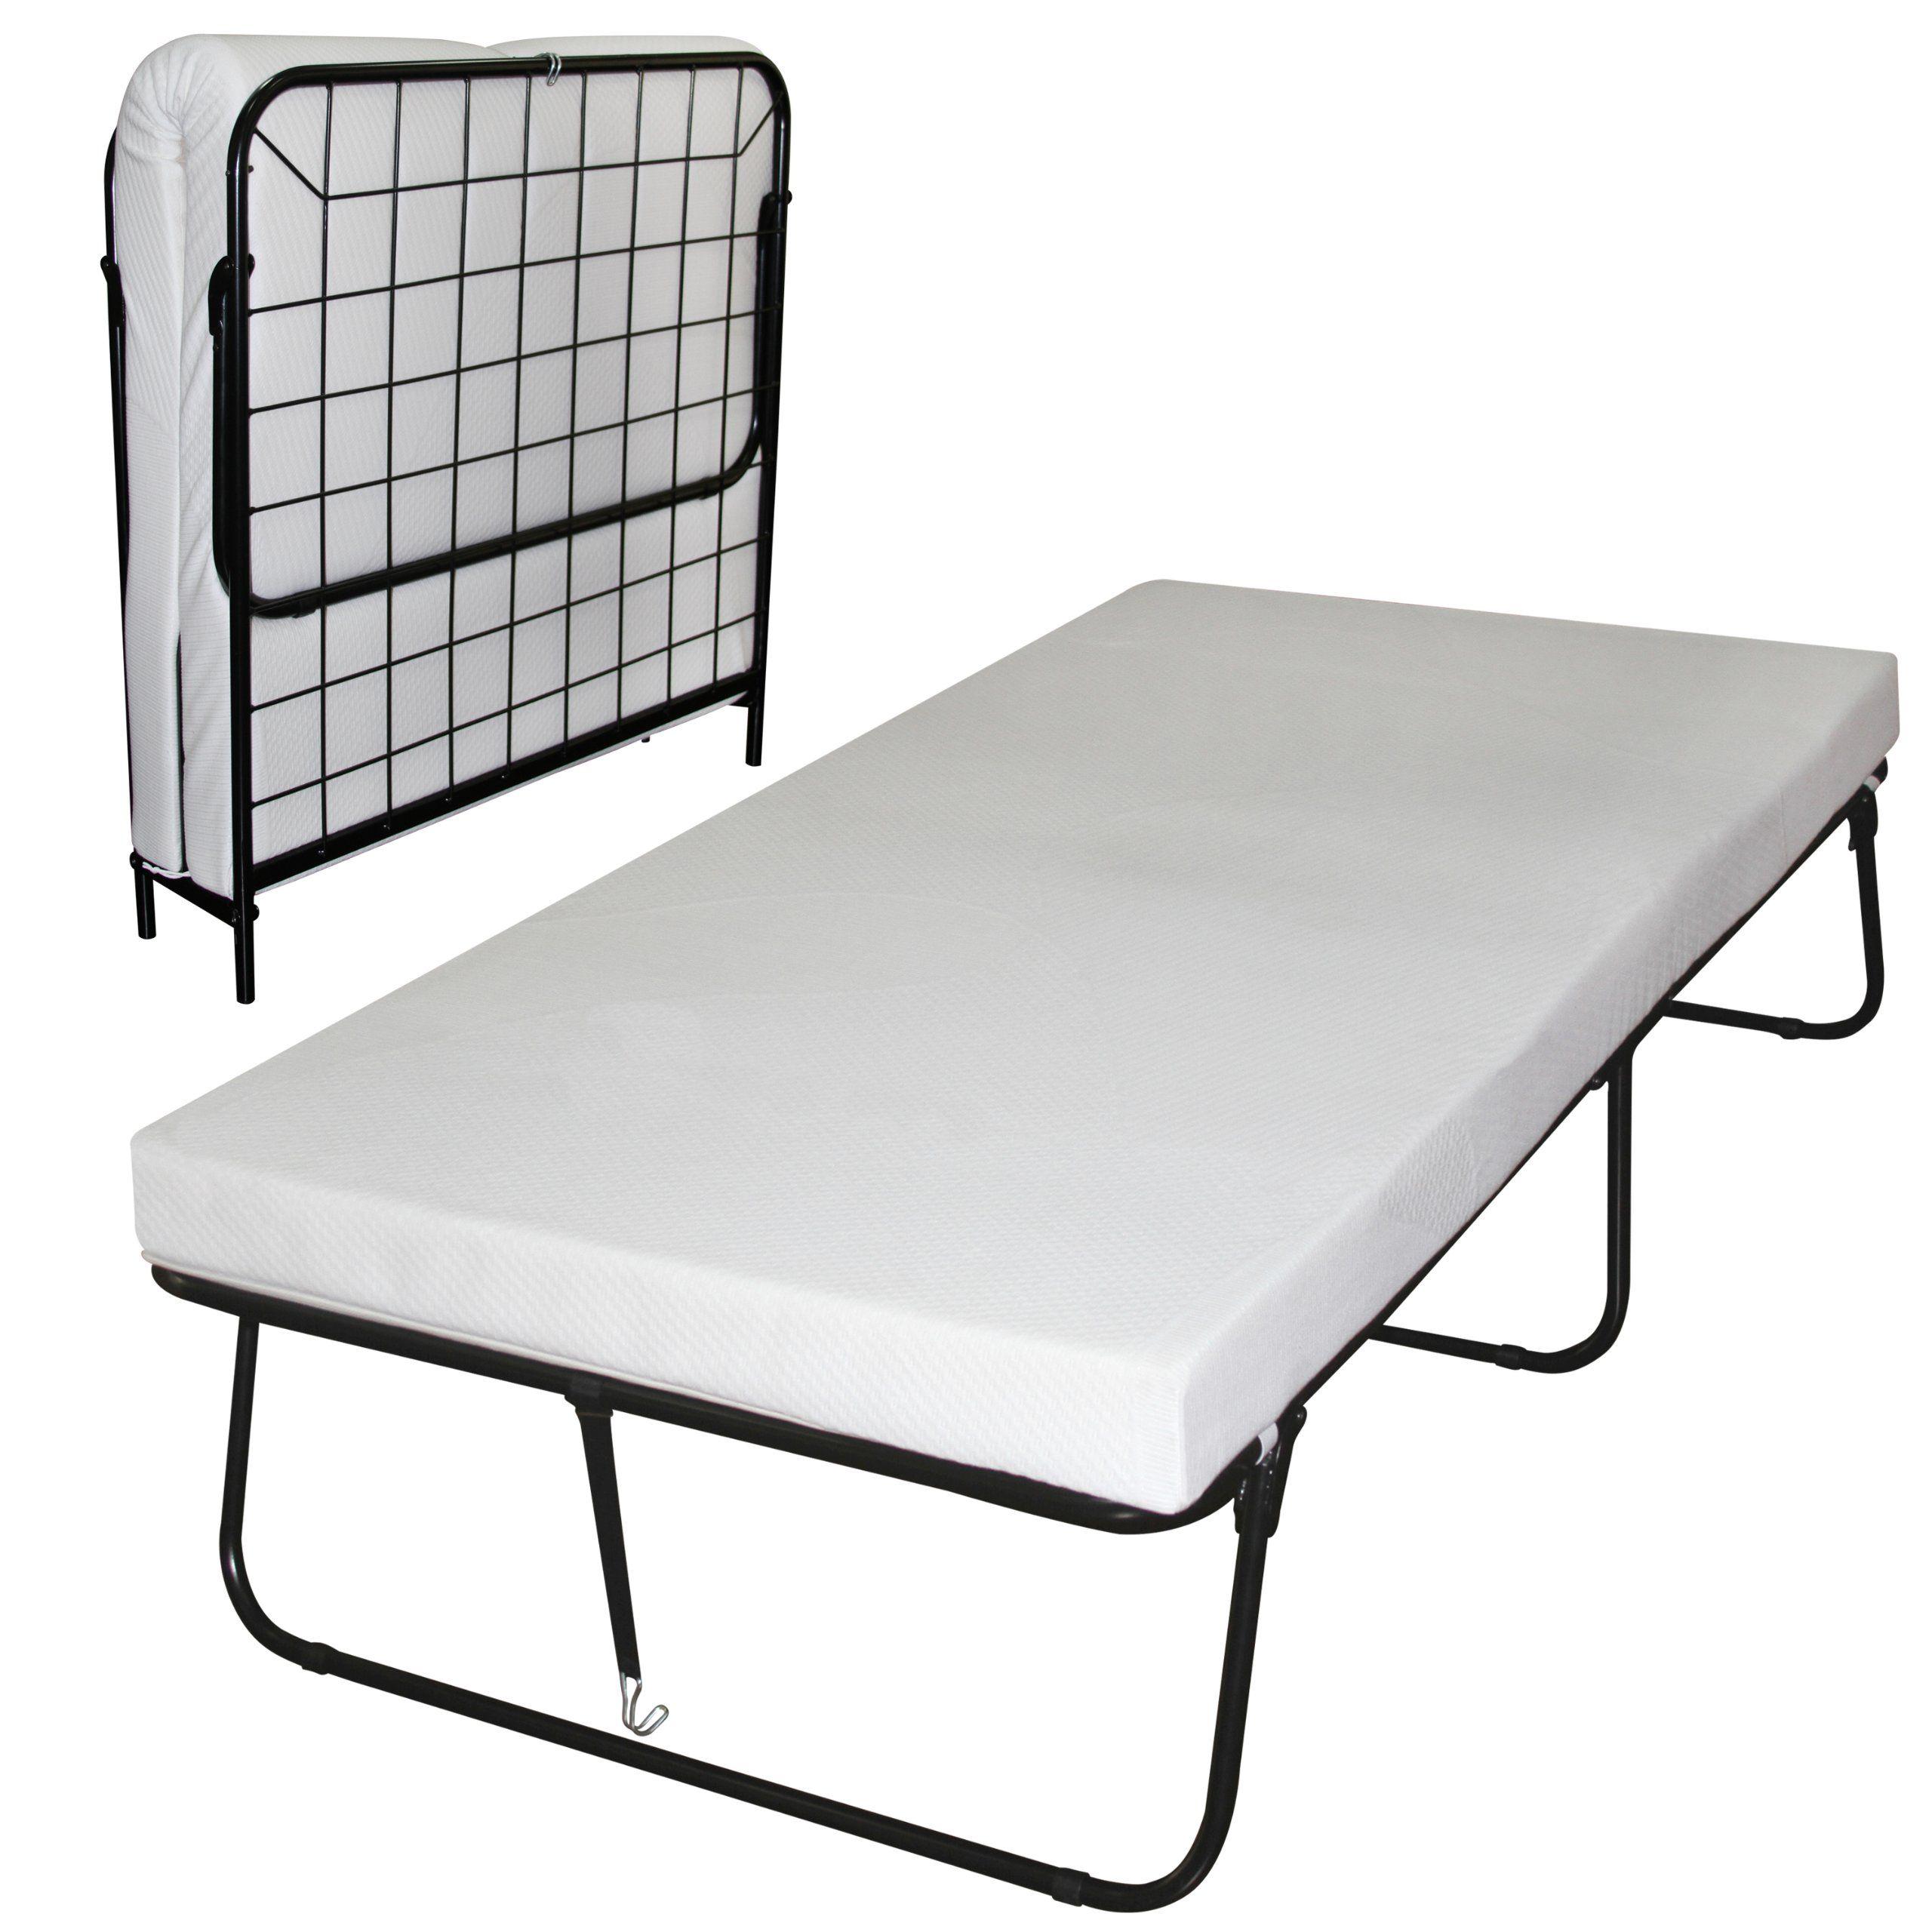 Amazon Com Sleep Master Traveler Premier Folding Frame Twin Guest Bed Plus Bonus Storage Bag Roll Away Beds Beds For Sale Guest Bed